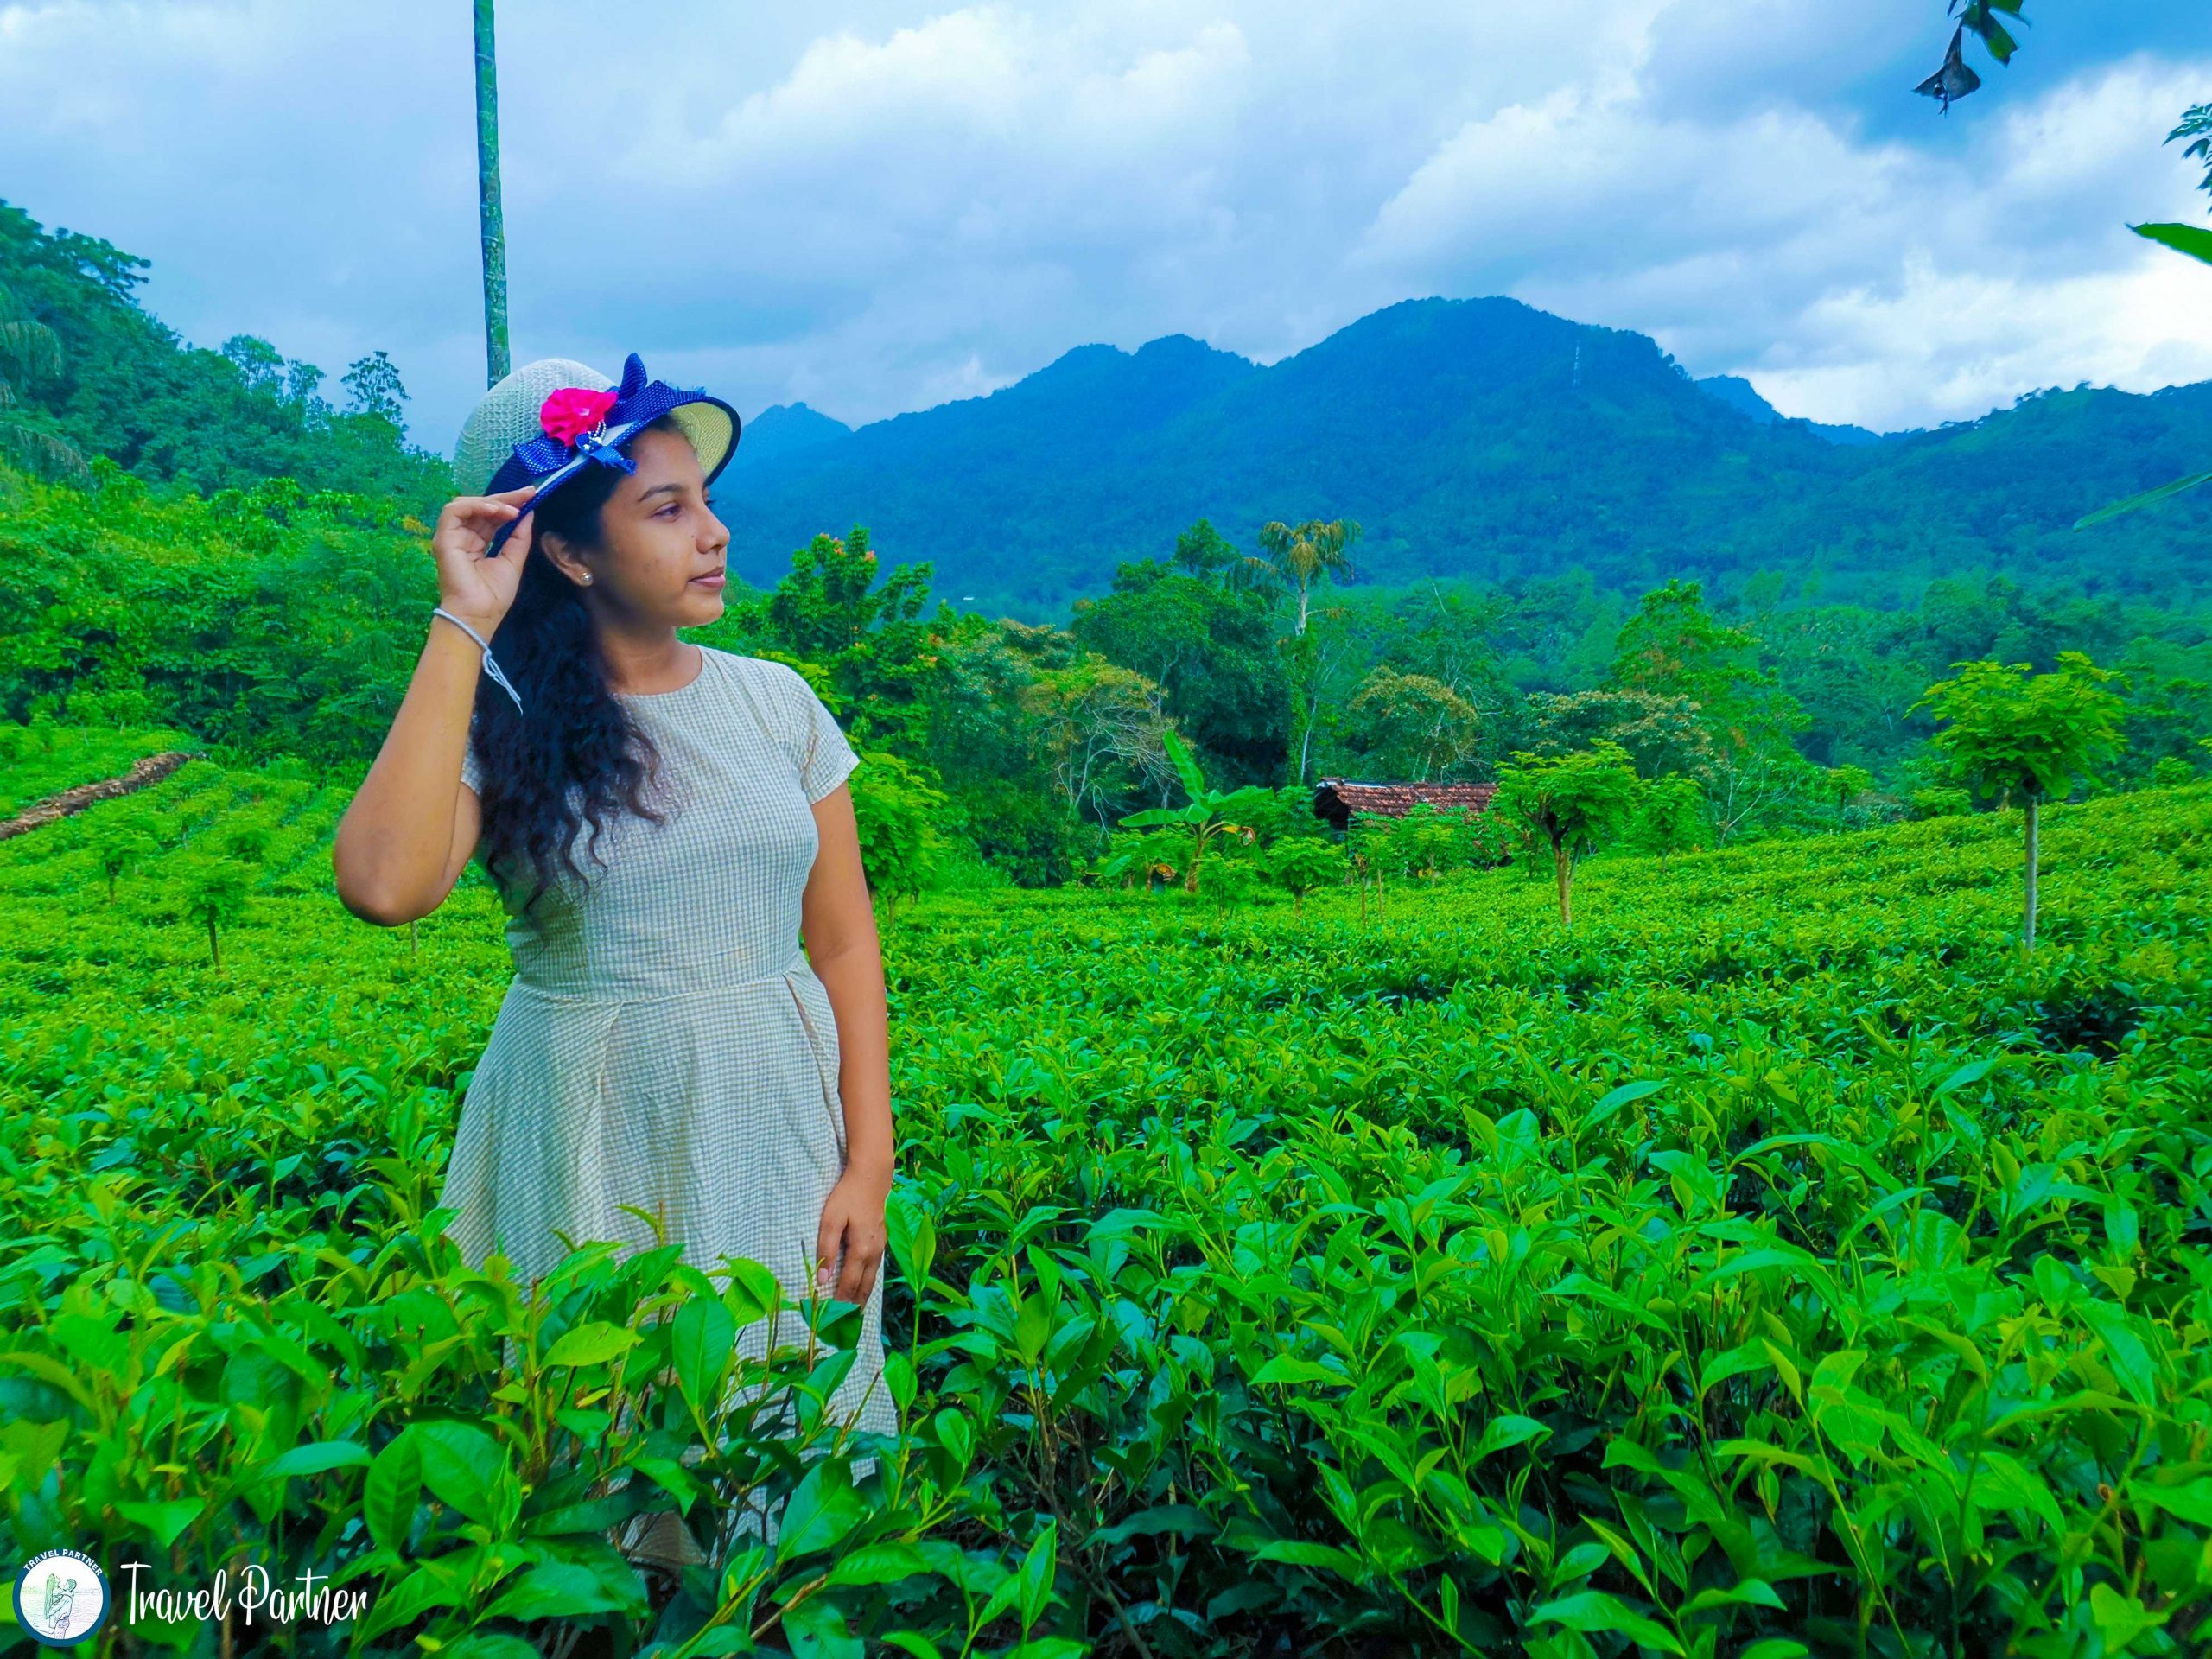 Kuruwita Sri Lanka Travel Partner